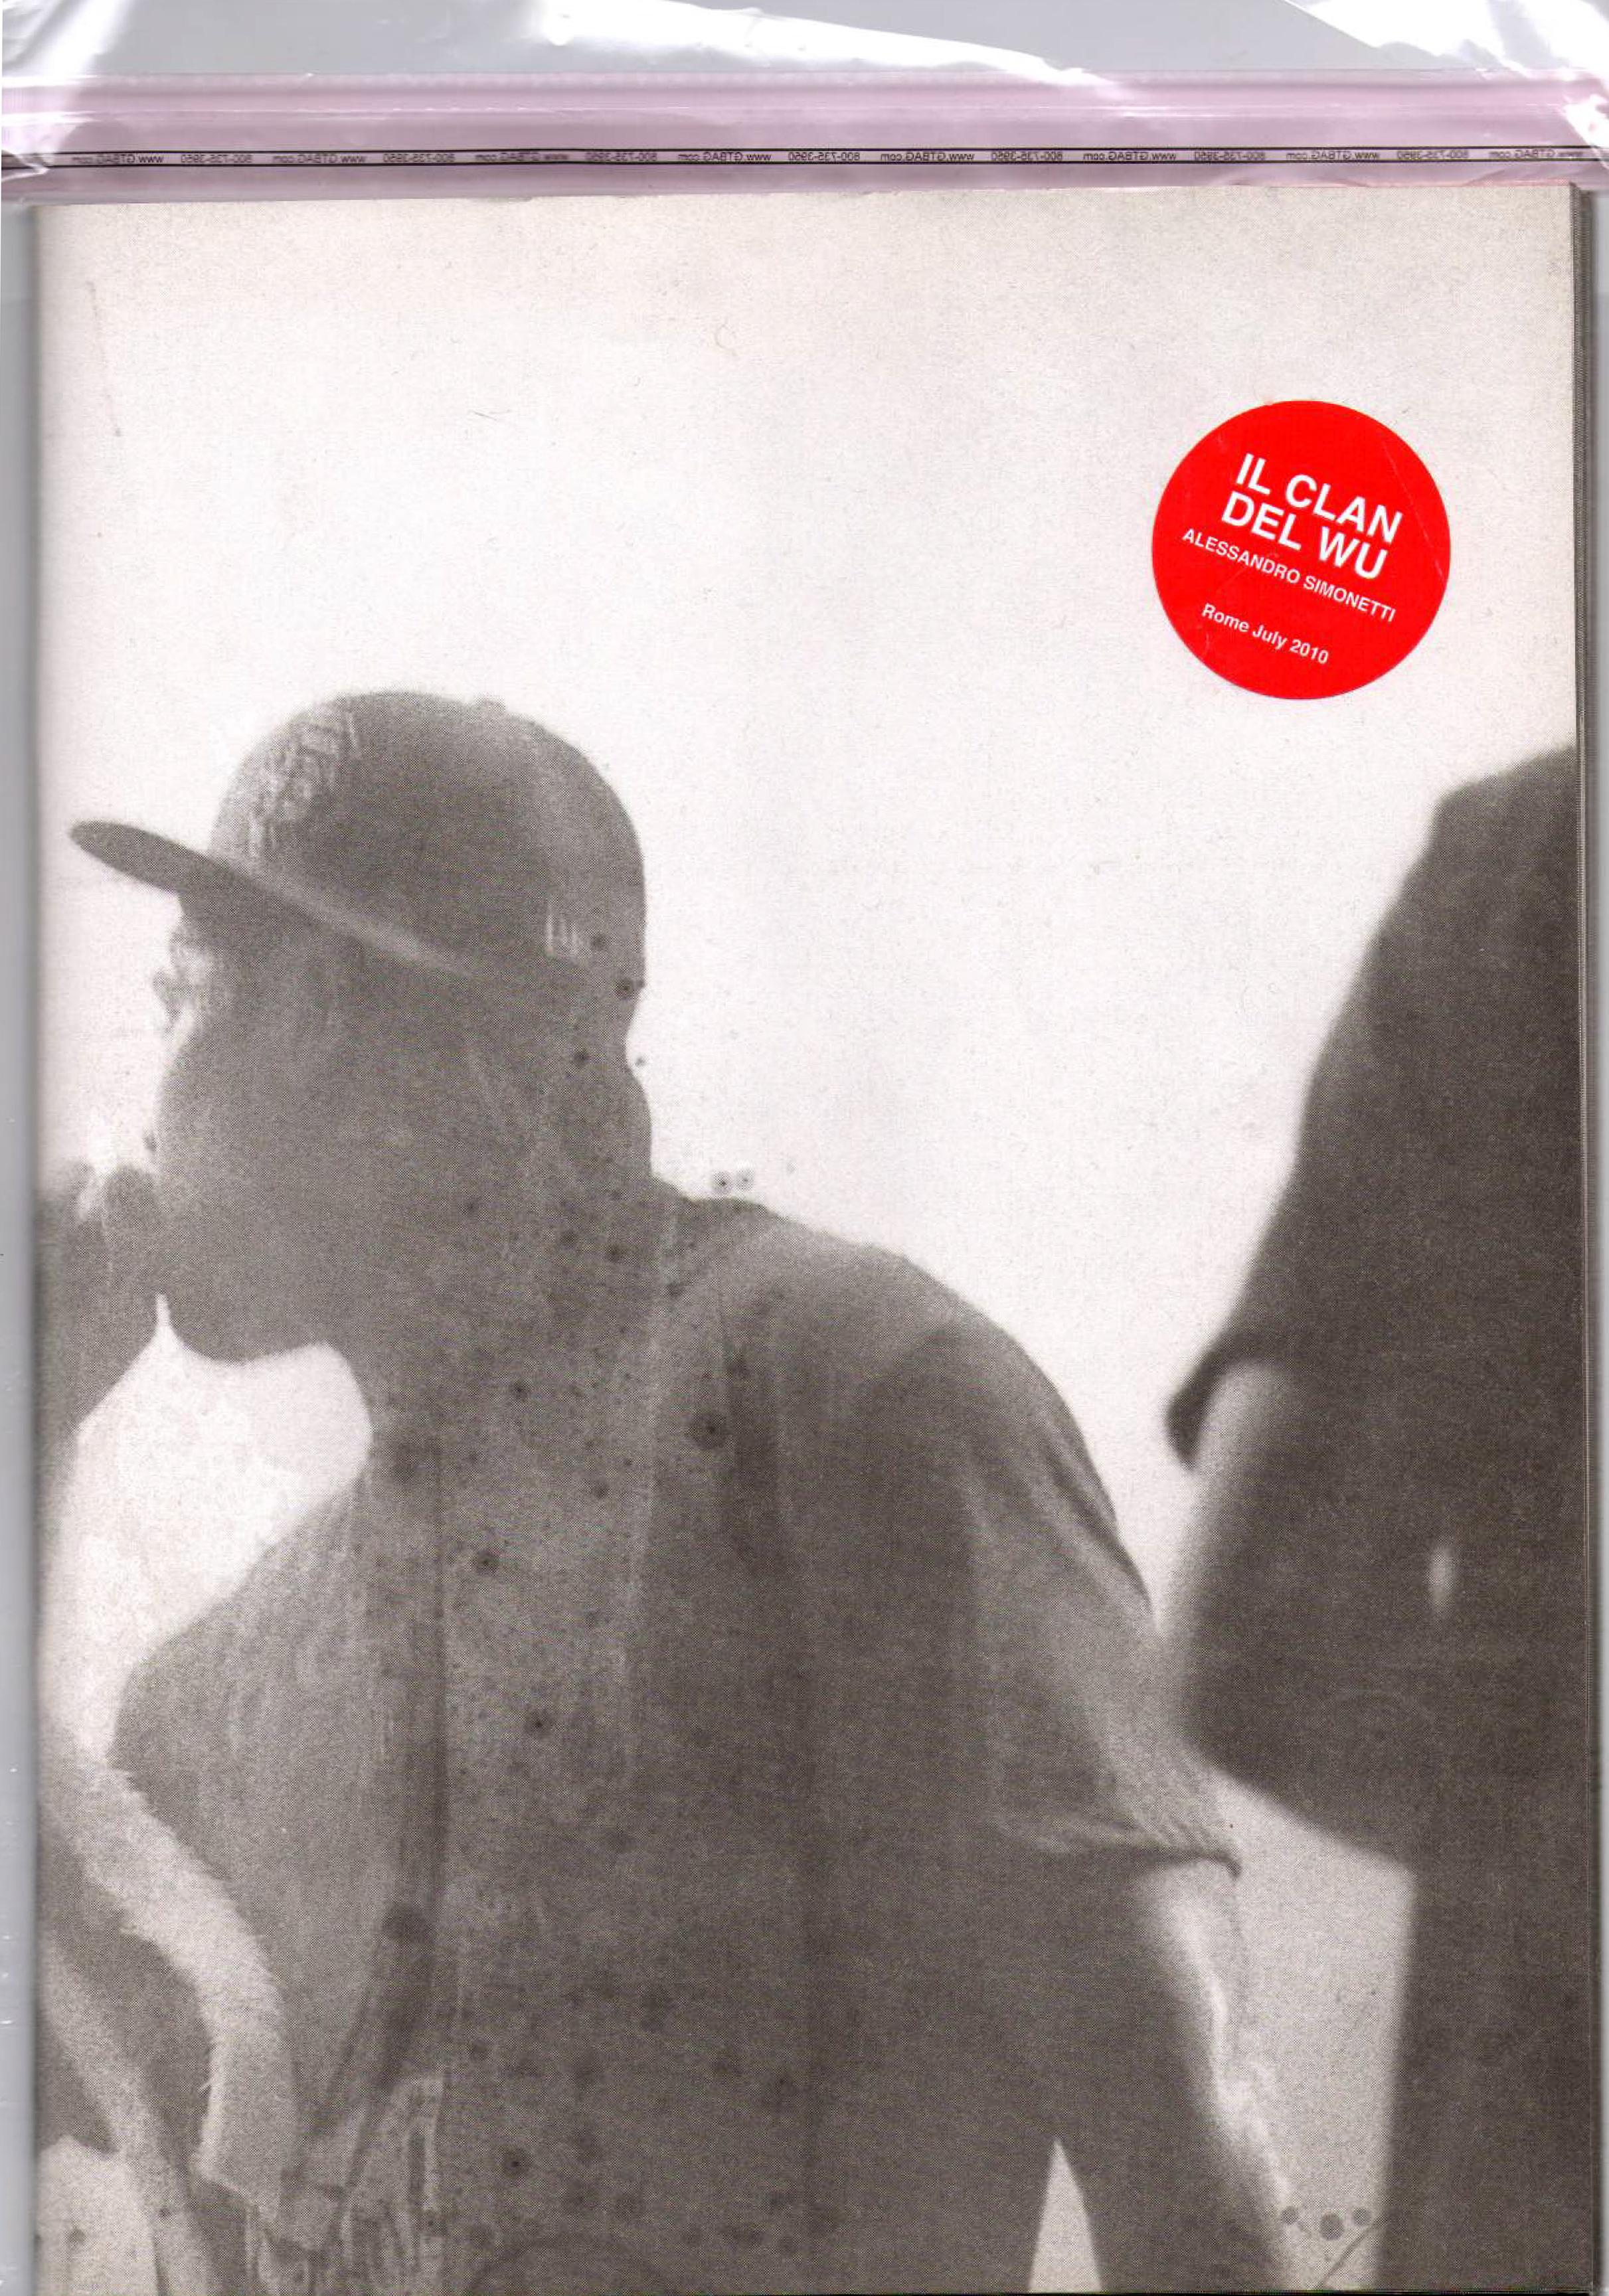 Alessandro Zuek Simonetti 'IL CLAN DEL WU' Booklet, The Standard Hotel, NYC a 848 Washington Street, New York, NY 10014